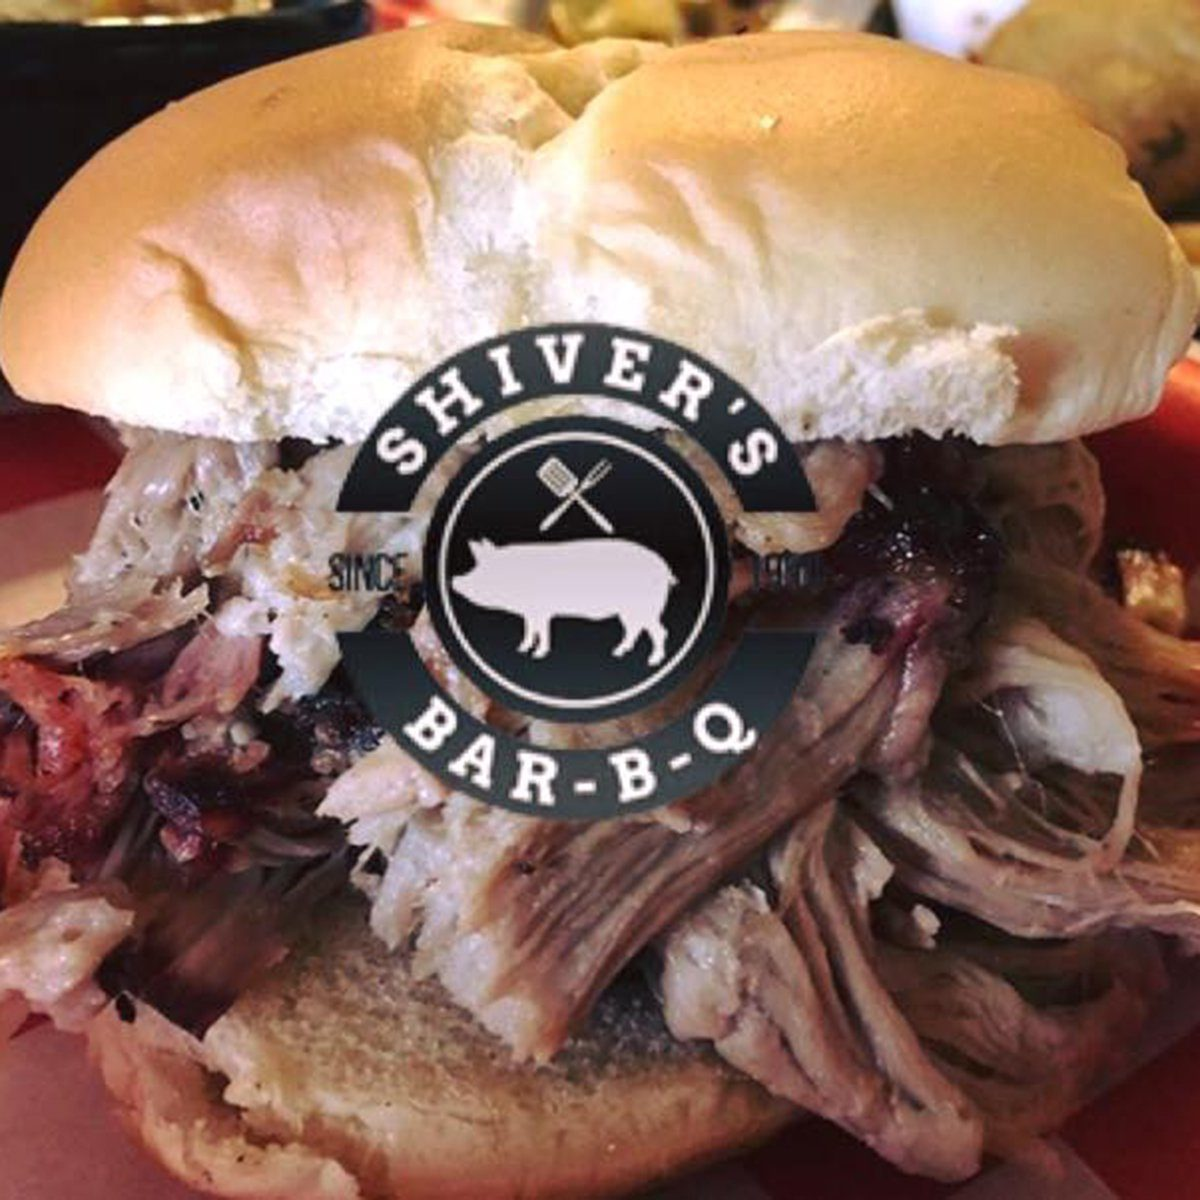 Shiver's Bar-B-Q